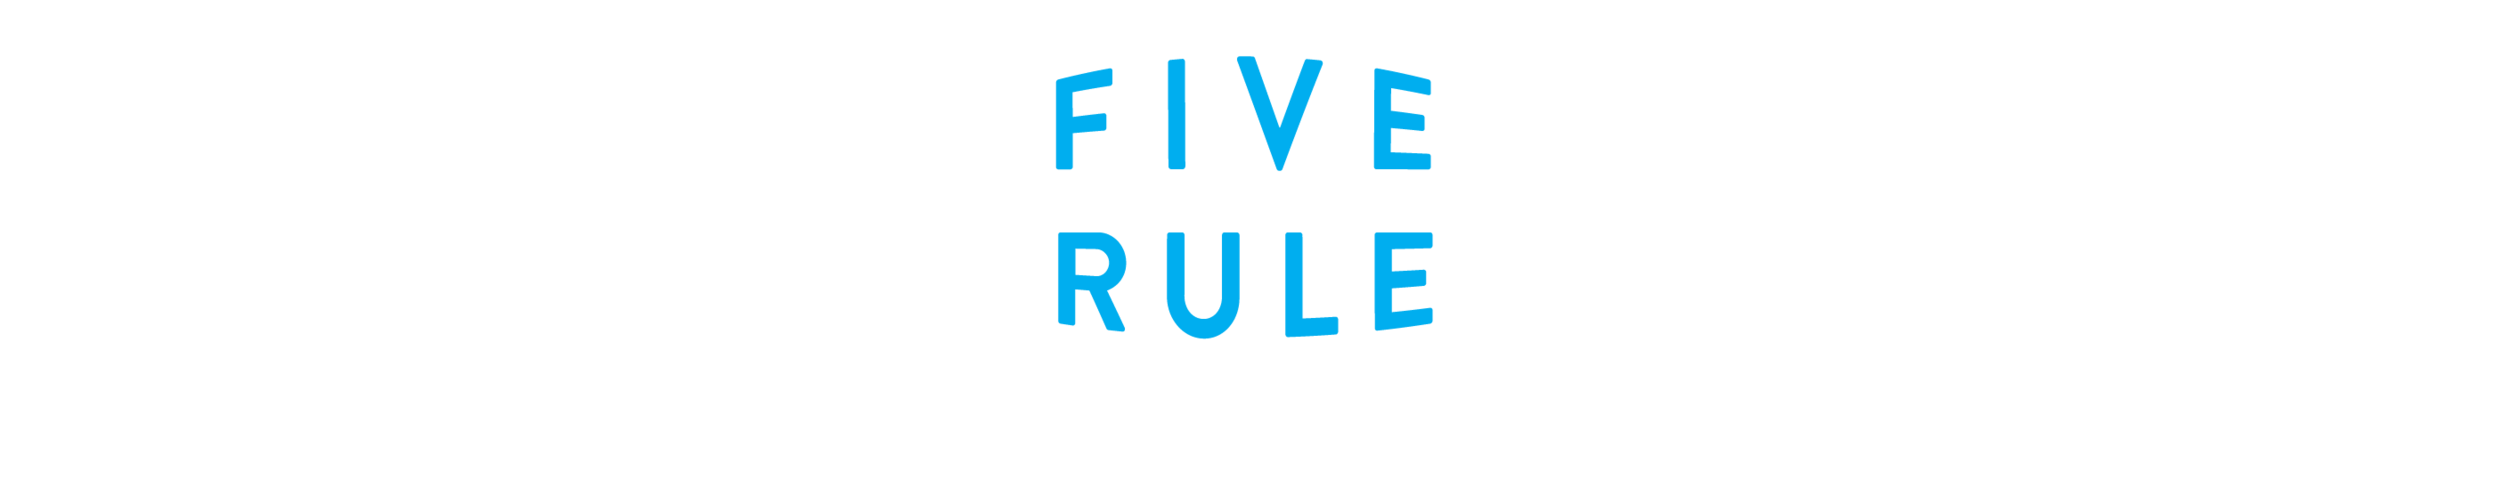 Five Rule Logo-2-02.png